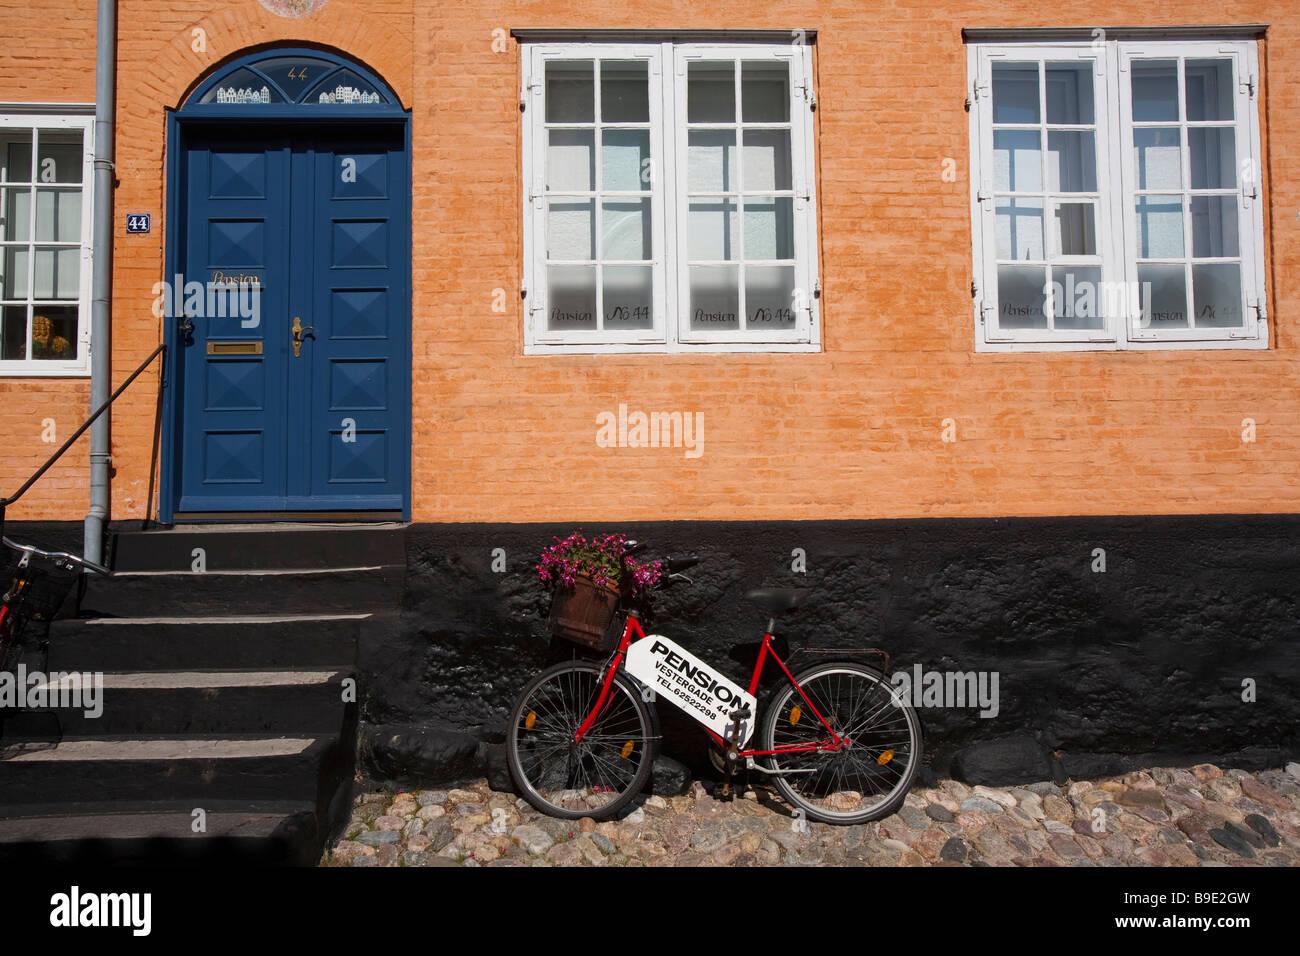 Old city Ærøskøbing Ærø island Funen Denmark - Stock Image